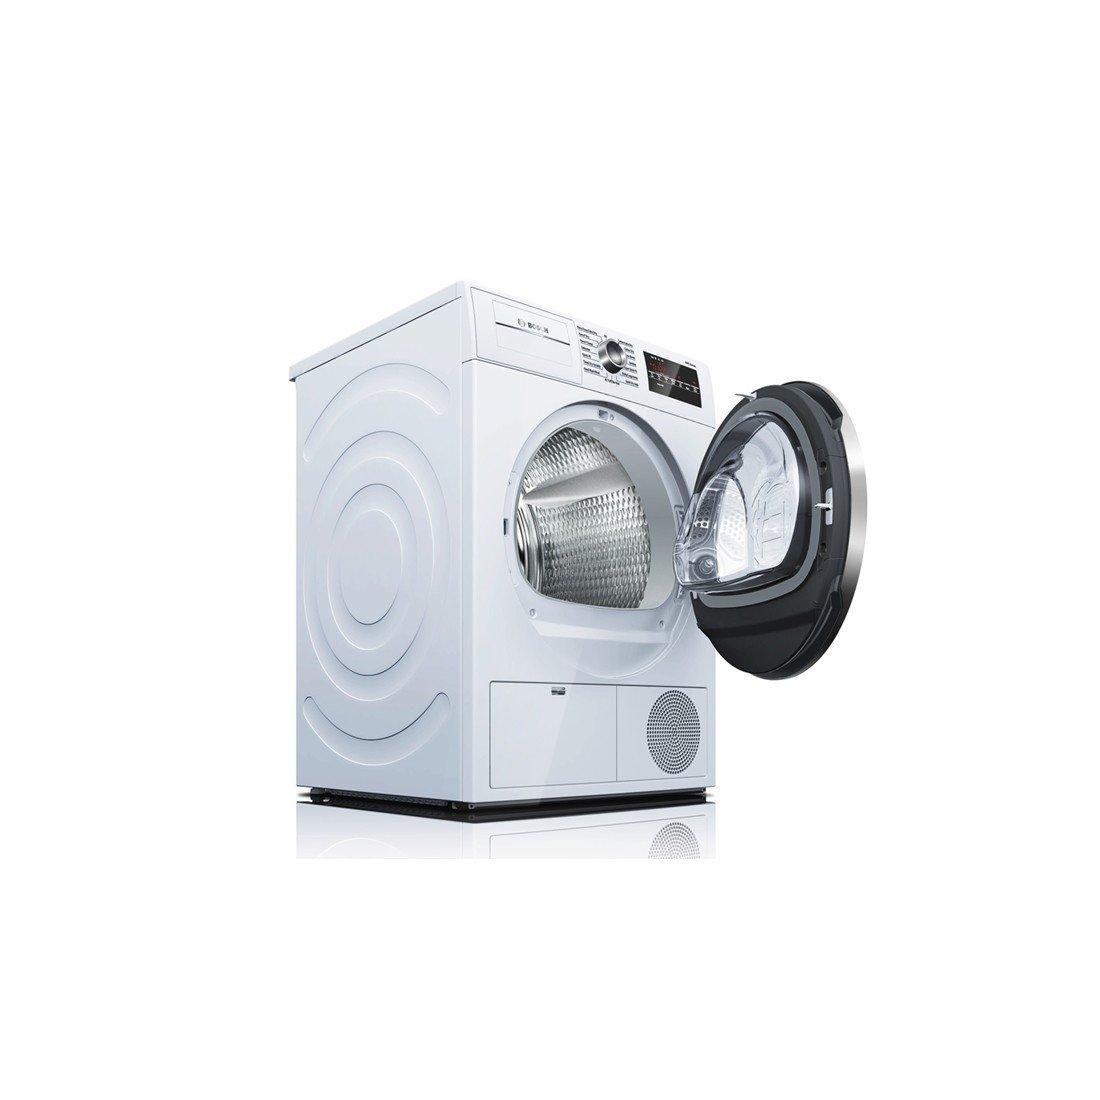 Amazon.com: Bosch WTG86402UC800 4.0 Cu. Ft. White Stackable Electric Dryer  - Energy Star: Appliances